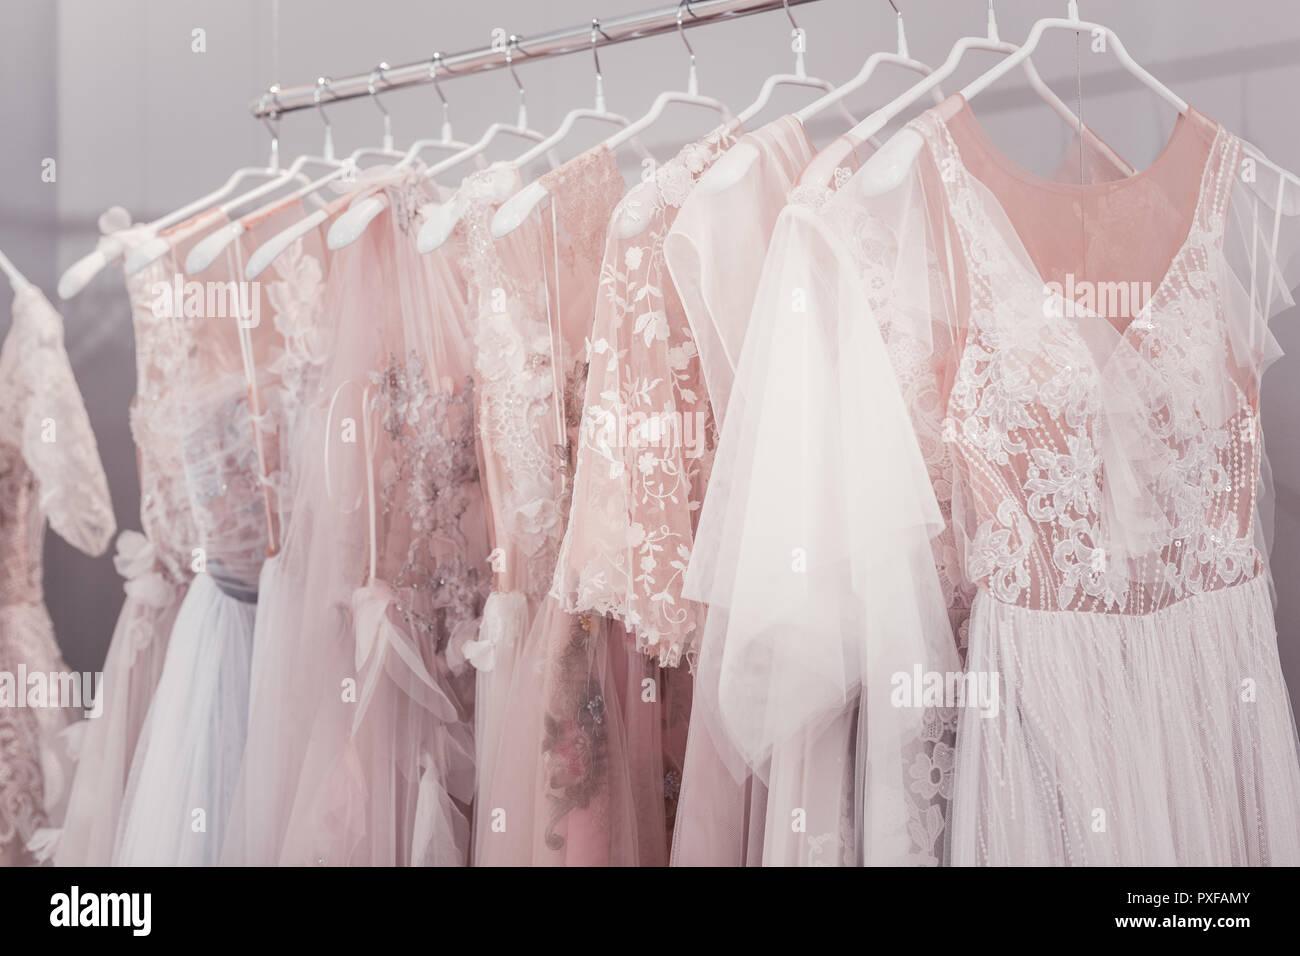 06c0bdb97b Beautiful wedding dresses hanging on hangers in the shop Stock Photo ...